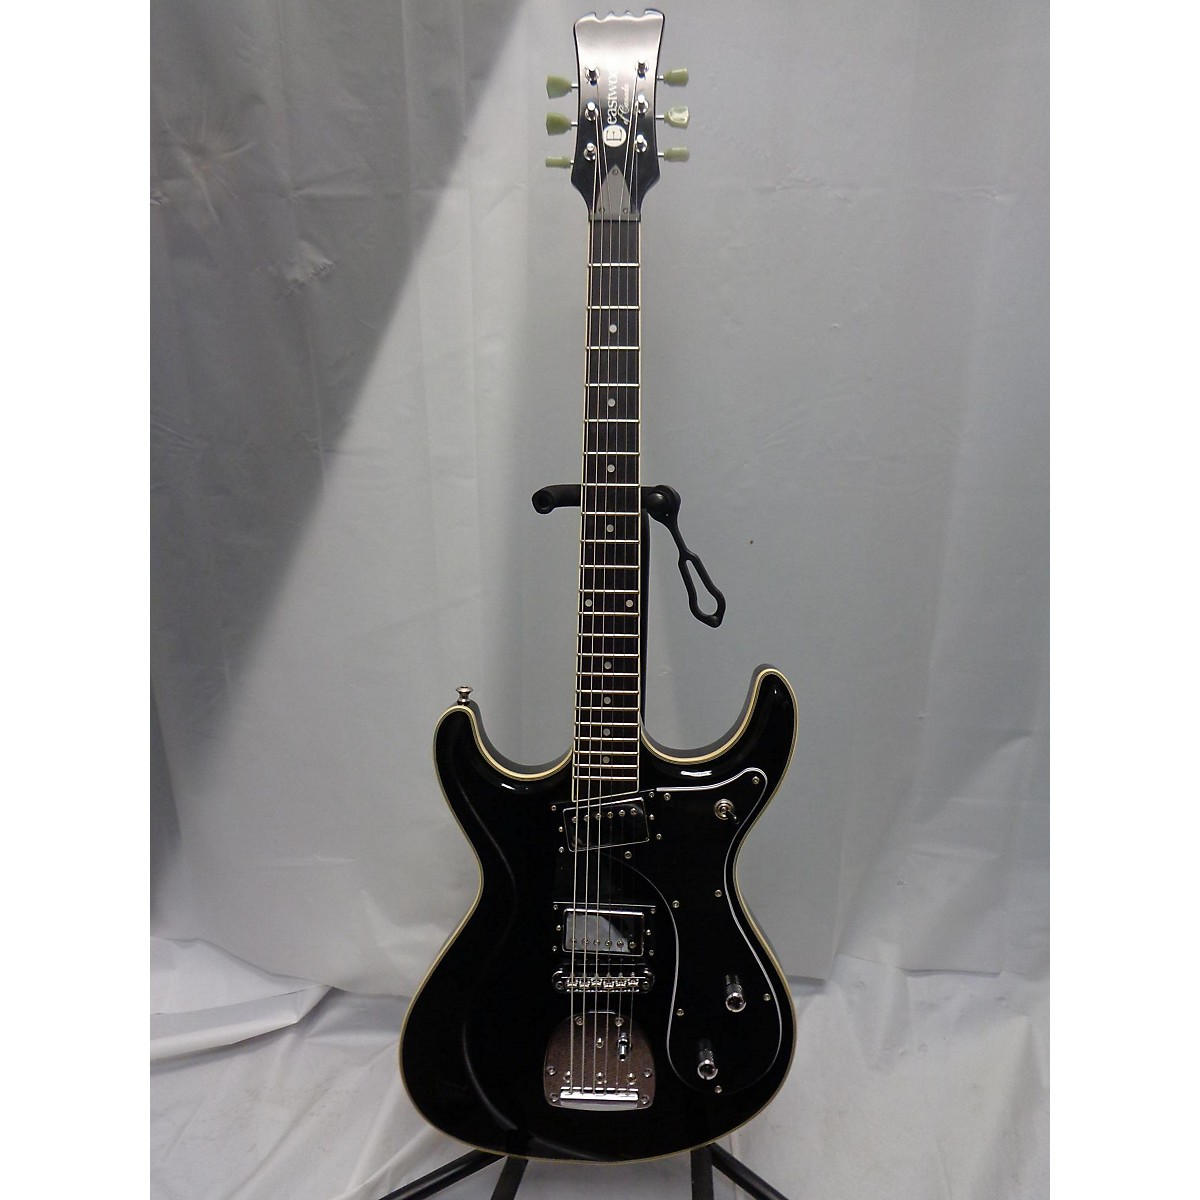 Eastwood Sidejack HB DLX Solid Body Electric Guitar